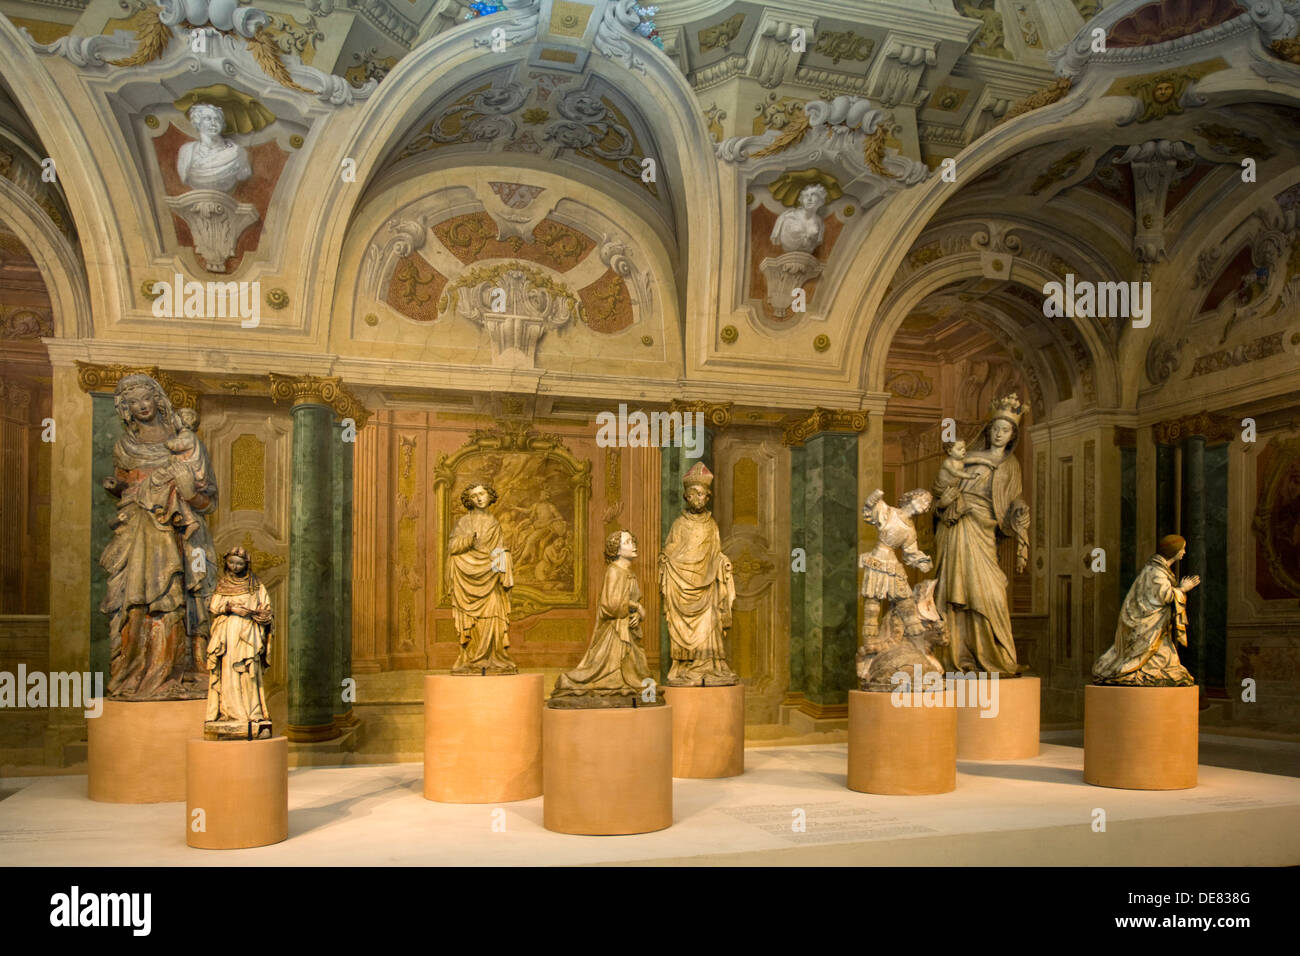 Österreich, Wien 3, Schloss Belvedere, Oberes Belvedere, Abteilung Mittelalter im Prunkstall - Stock Image